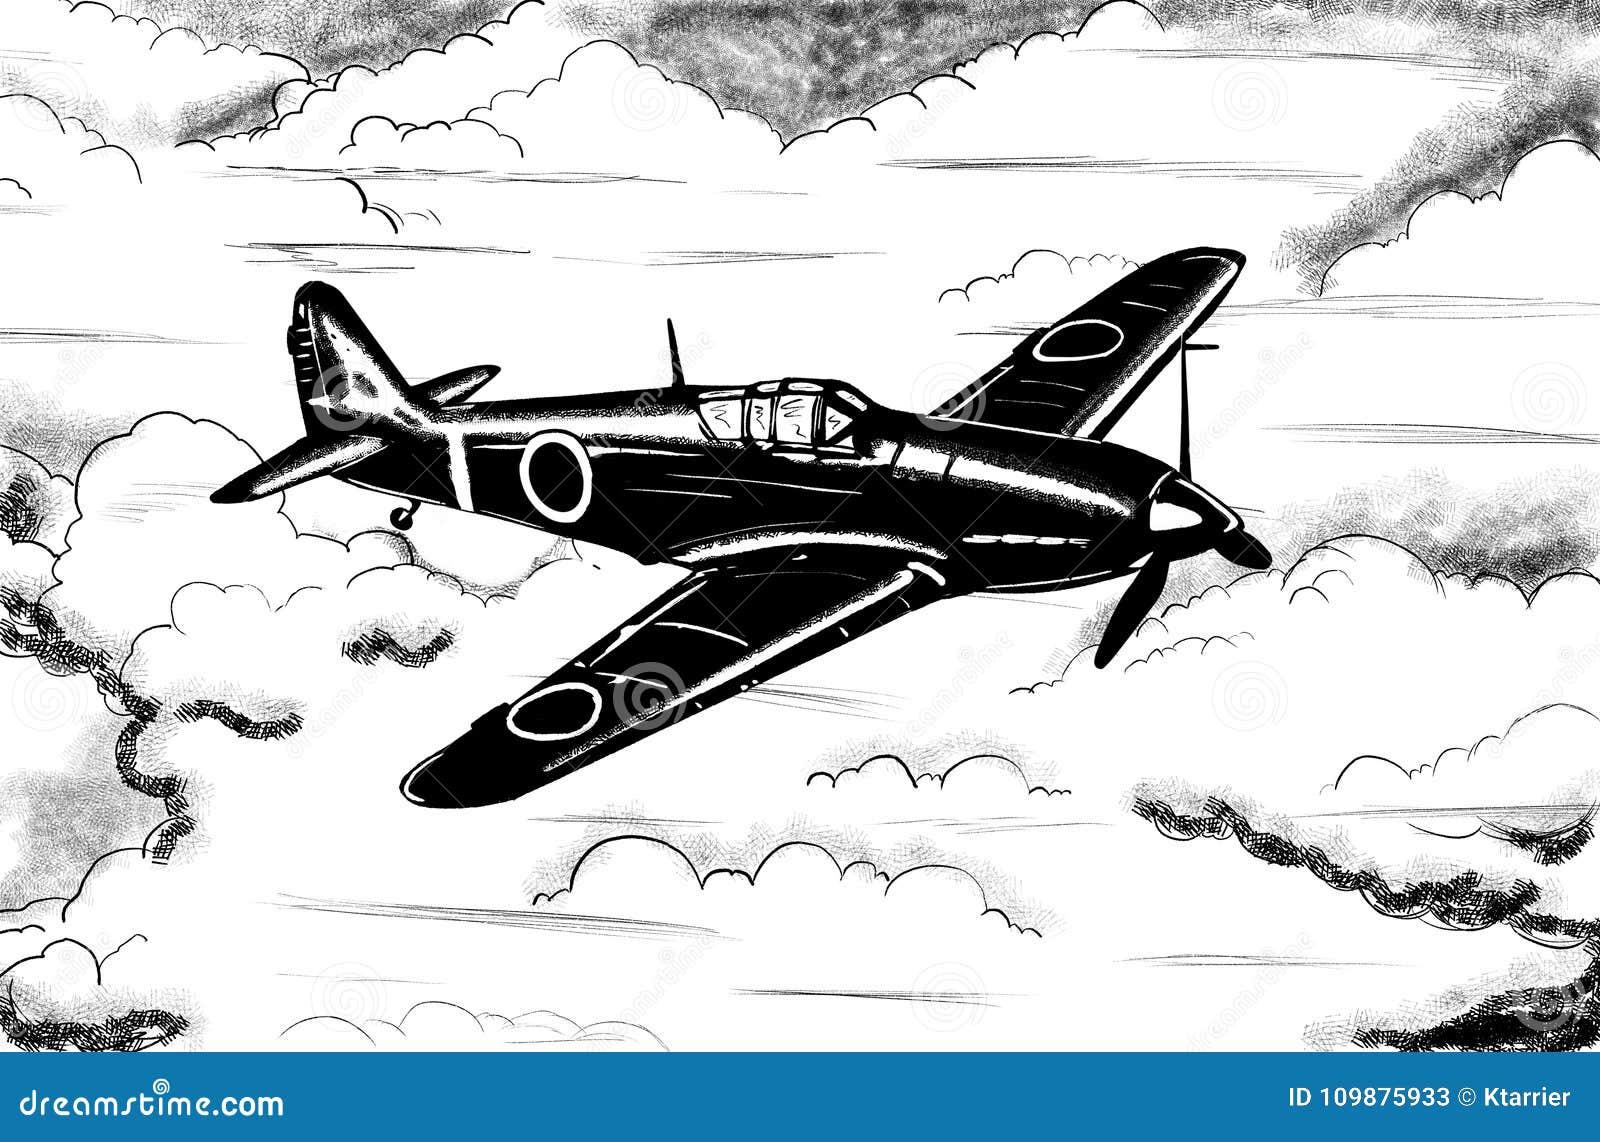 World War 2 Vintage Aircraft Digital Drawing Stock Illustration